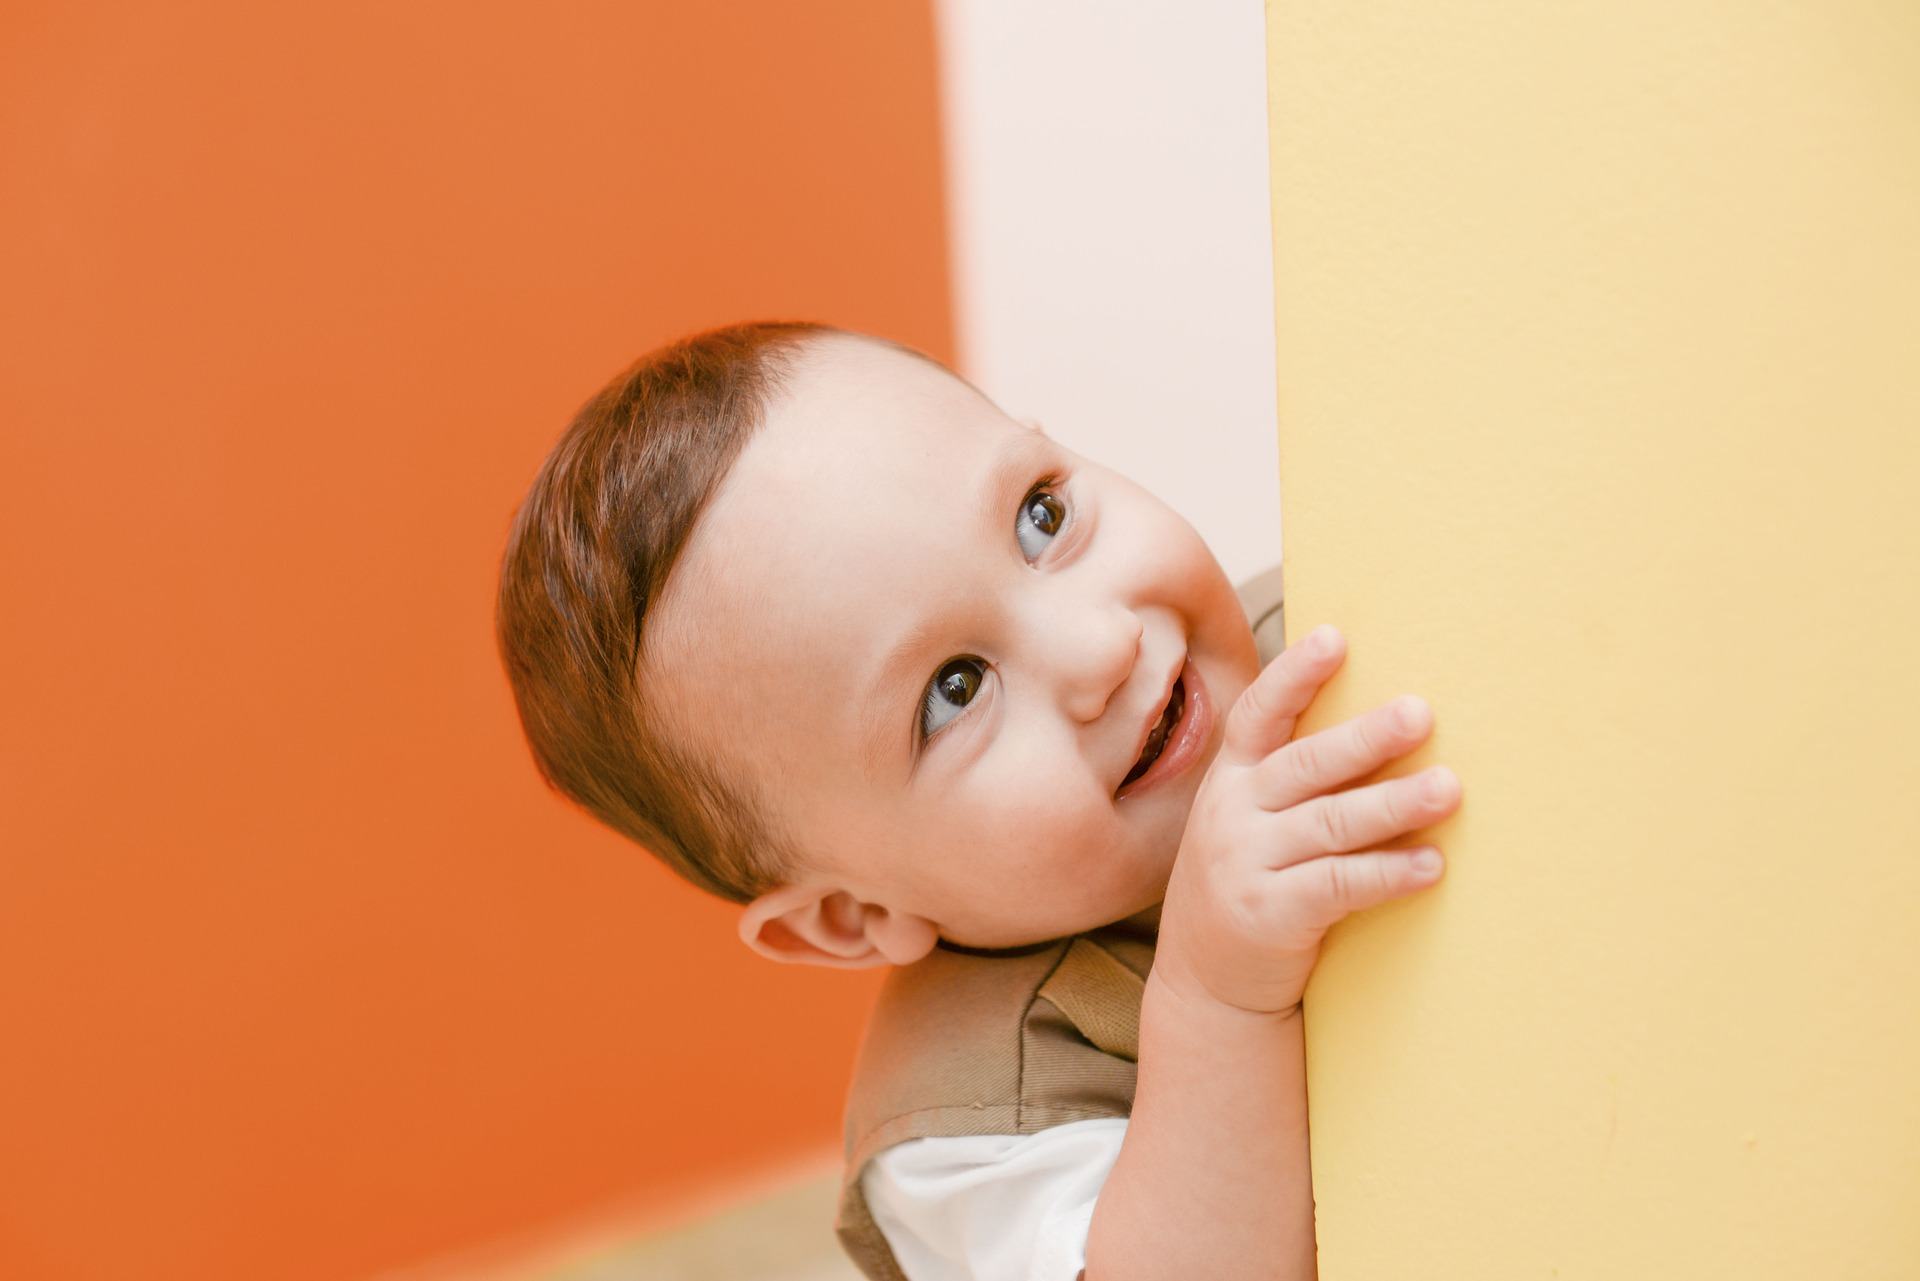 optymizm-u-dziecka